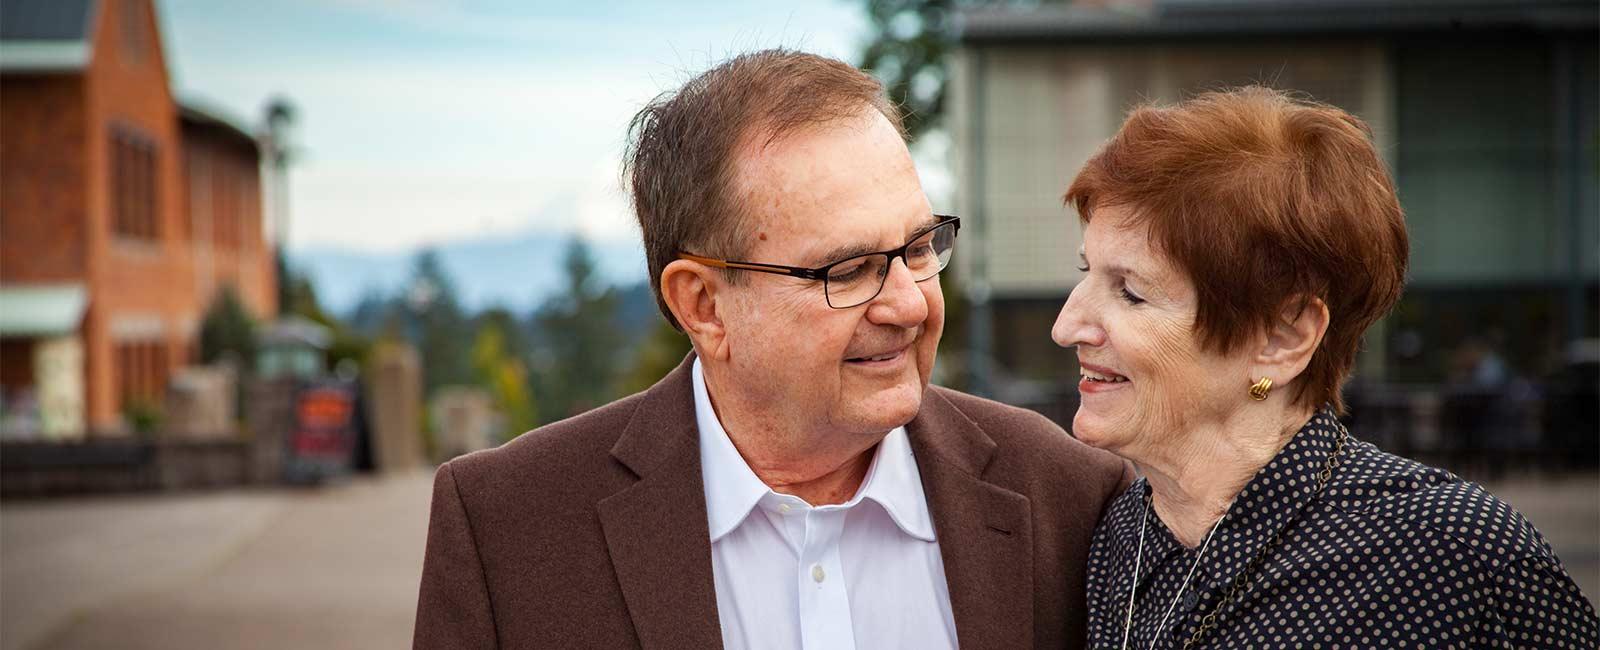 Fritz and Julie Clarke